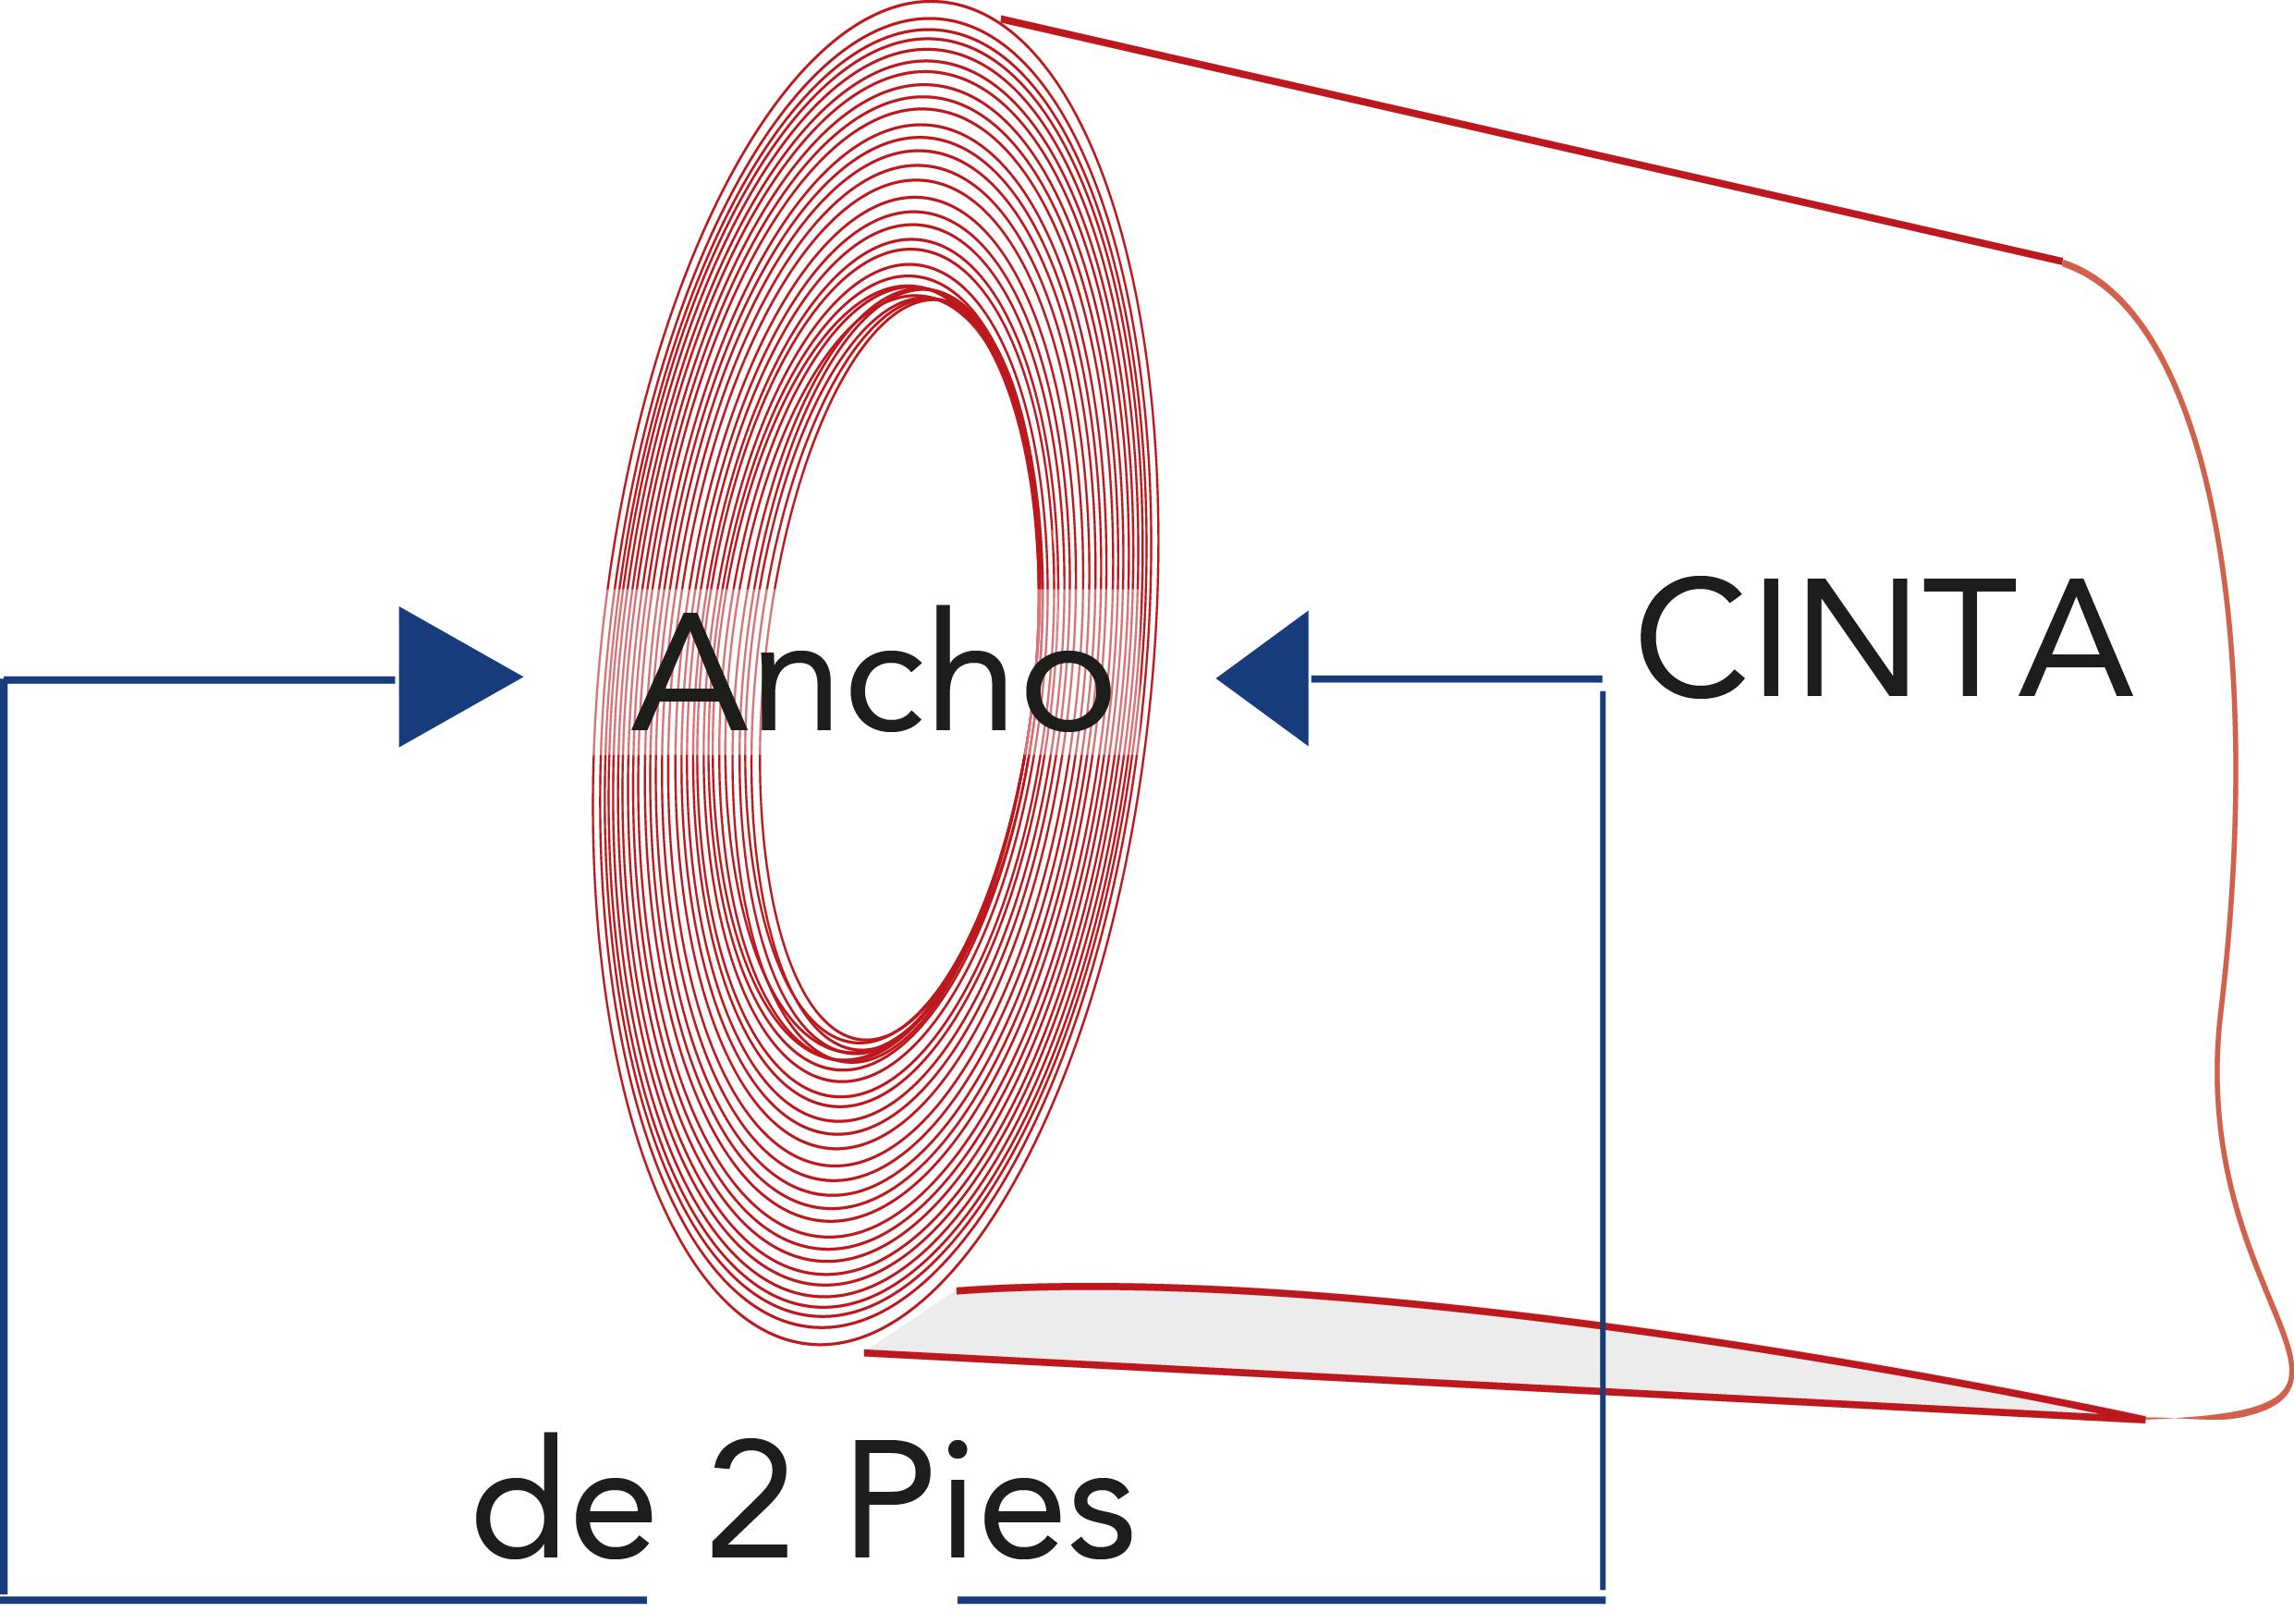 cinta-de-acero-panelyacanalados